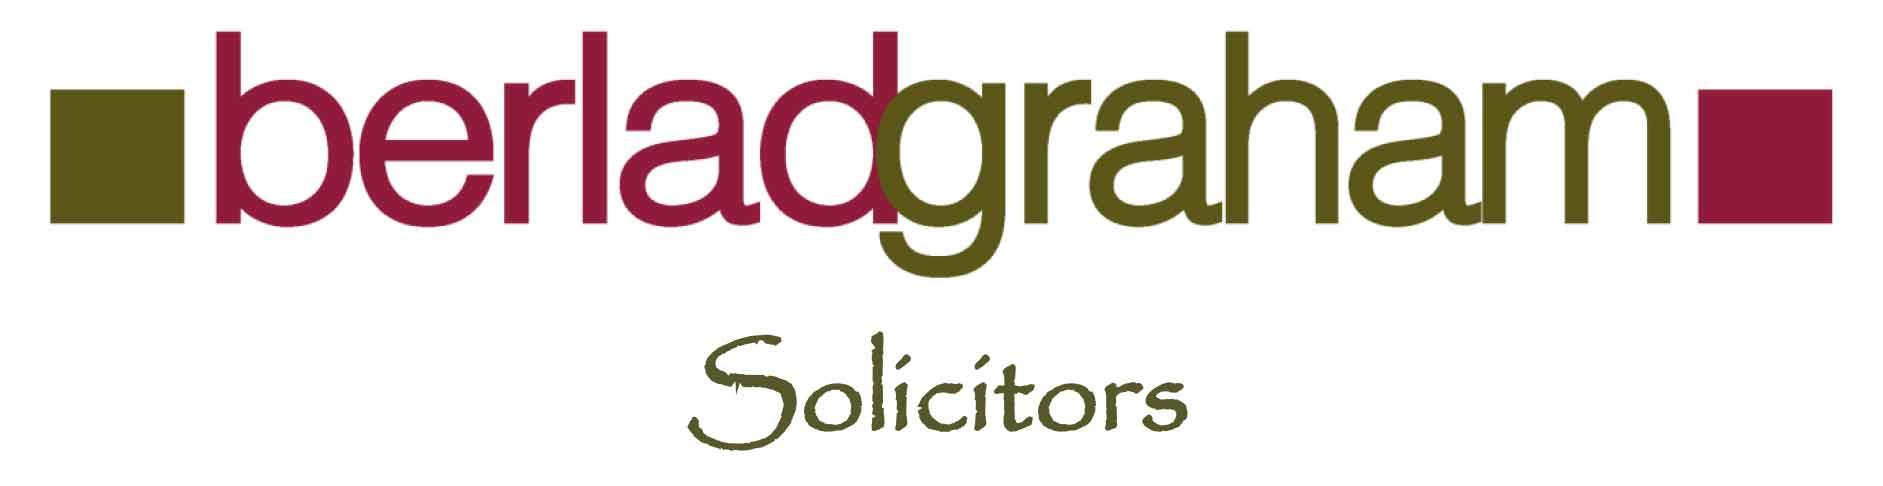 Berlad Graham Solicitors, London, United Kingdom